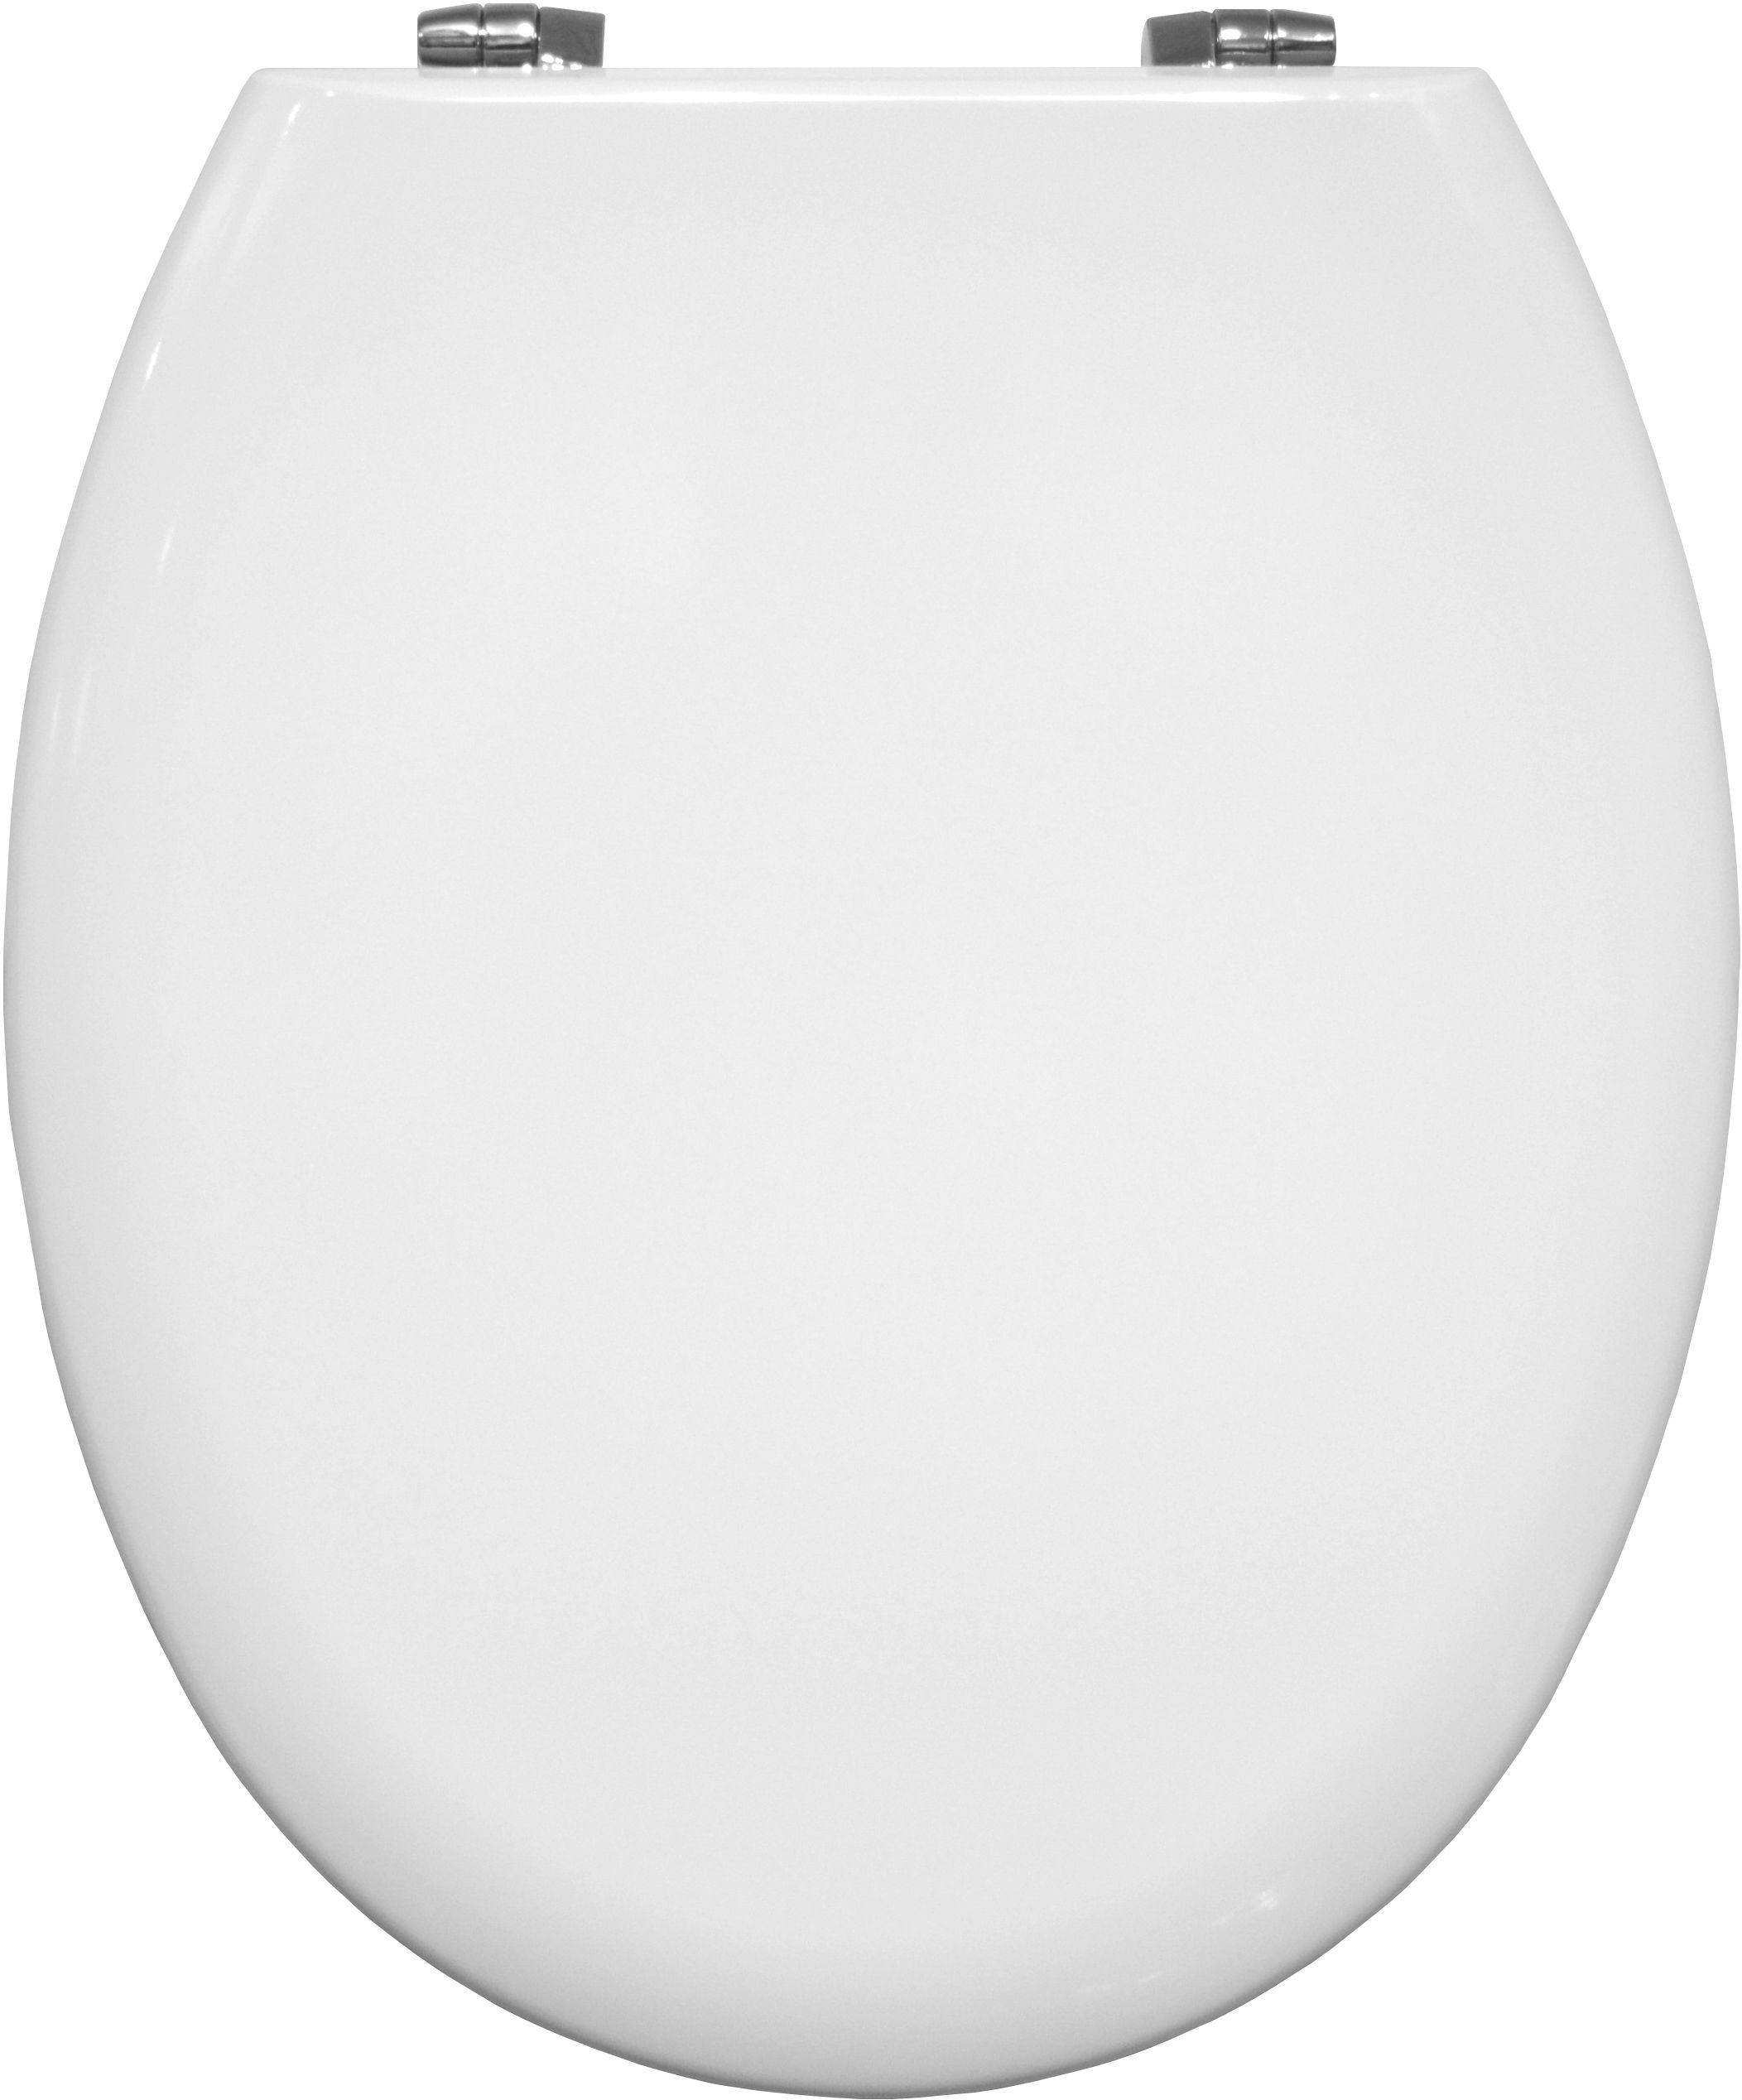 Bemis - Manhattan Moulded Wood - Toilet Seat - White